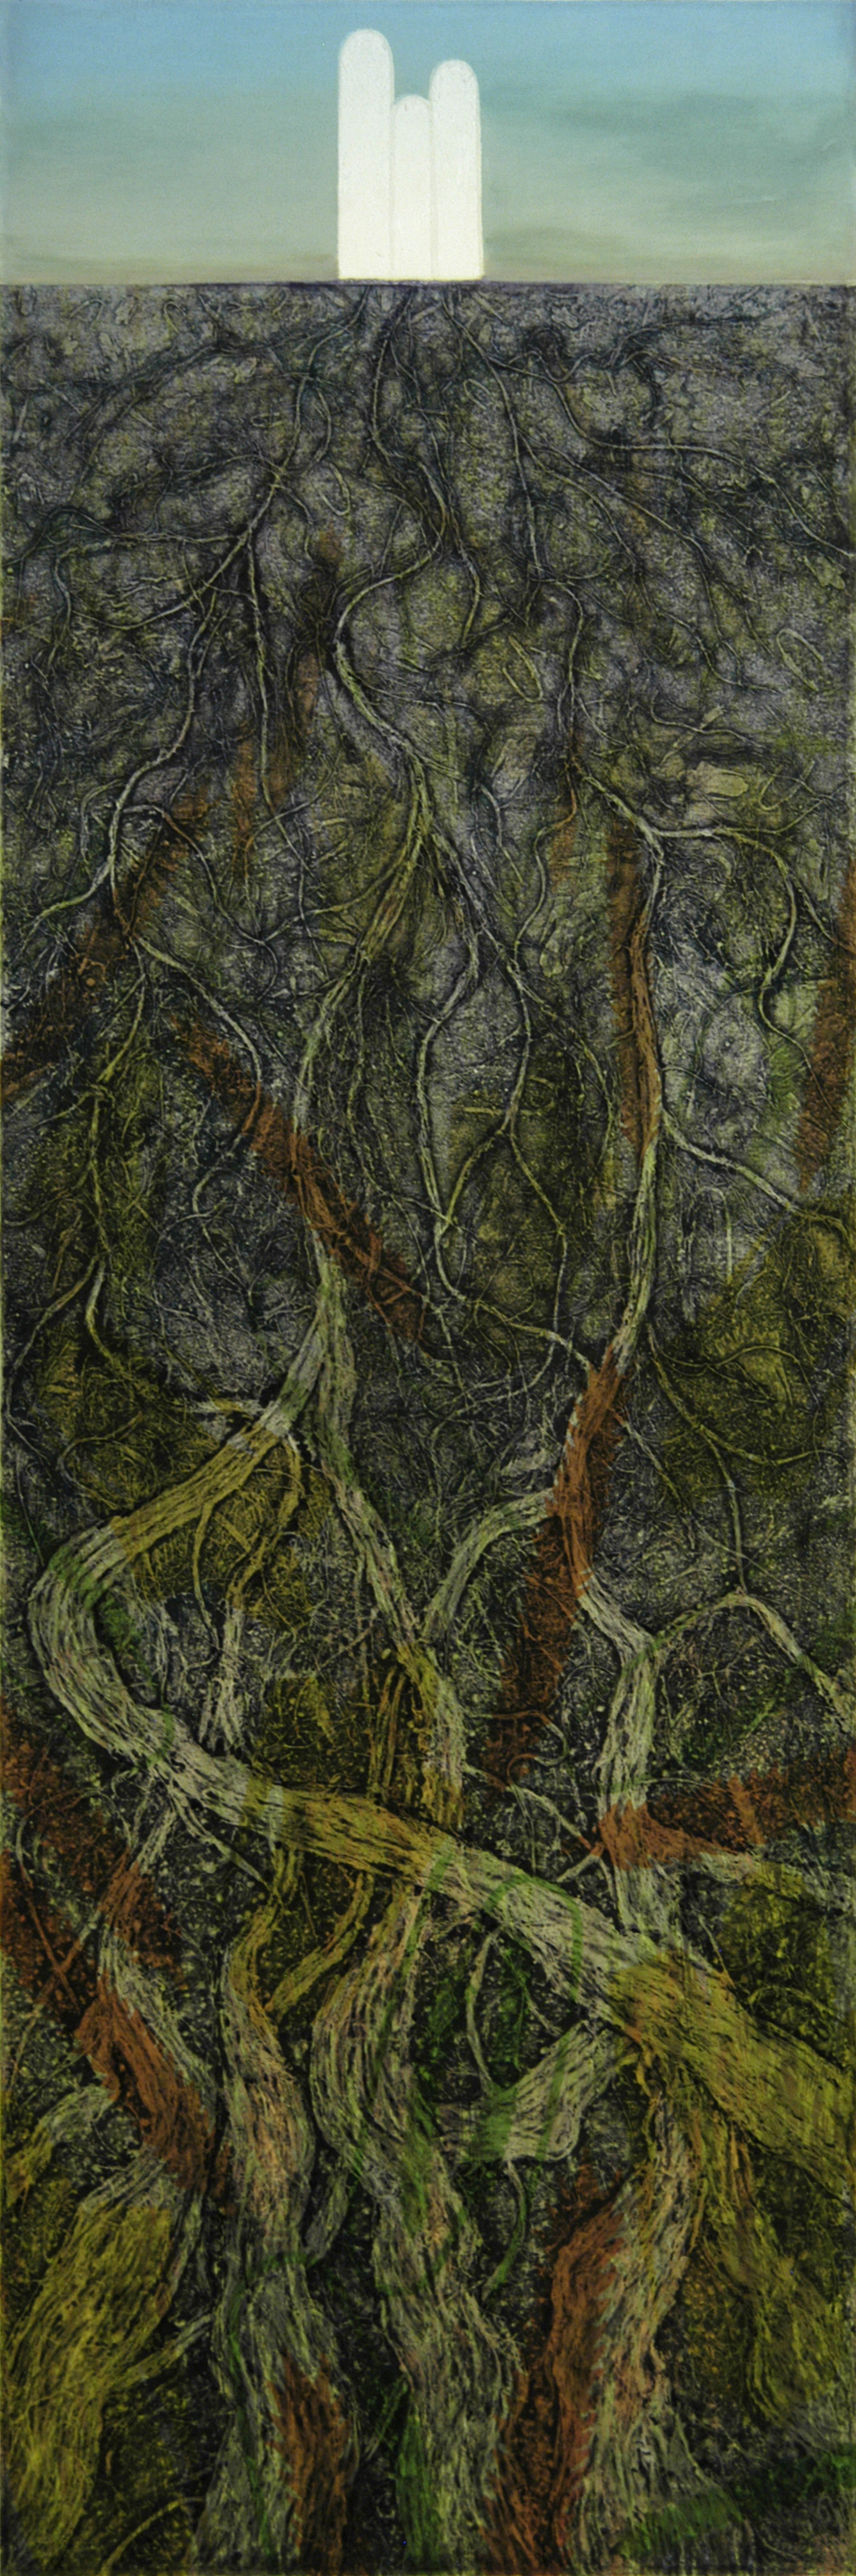 Sustenance Roots V